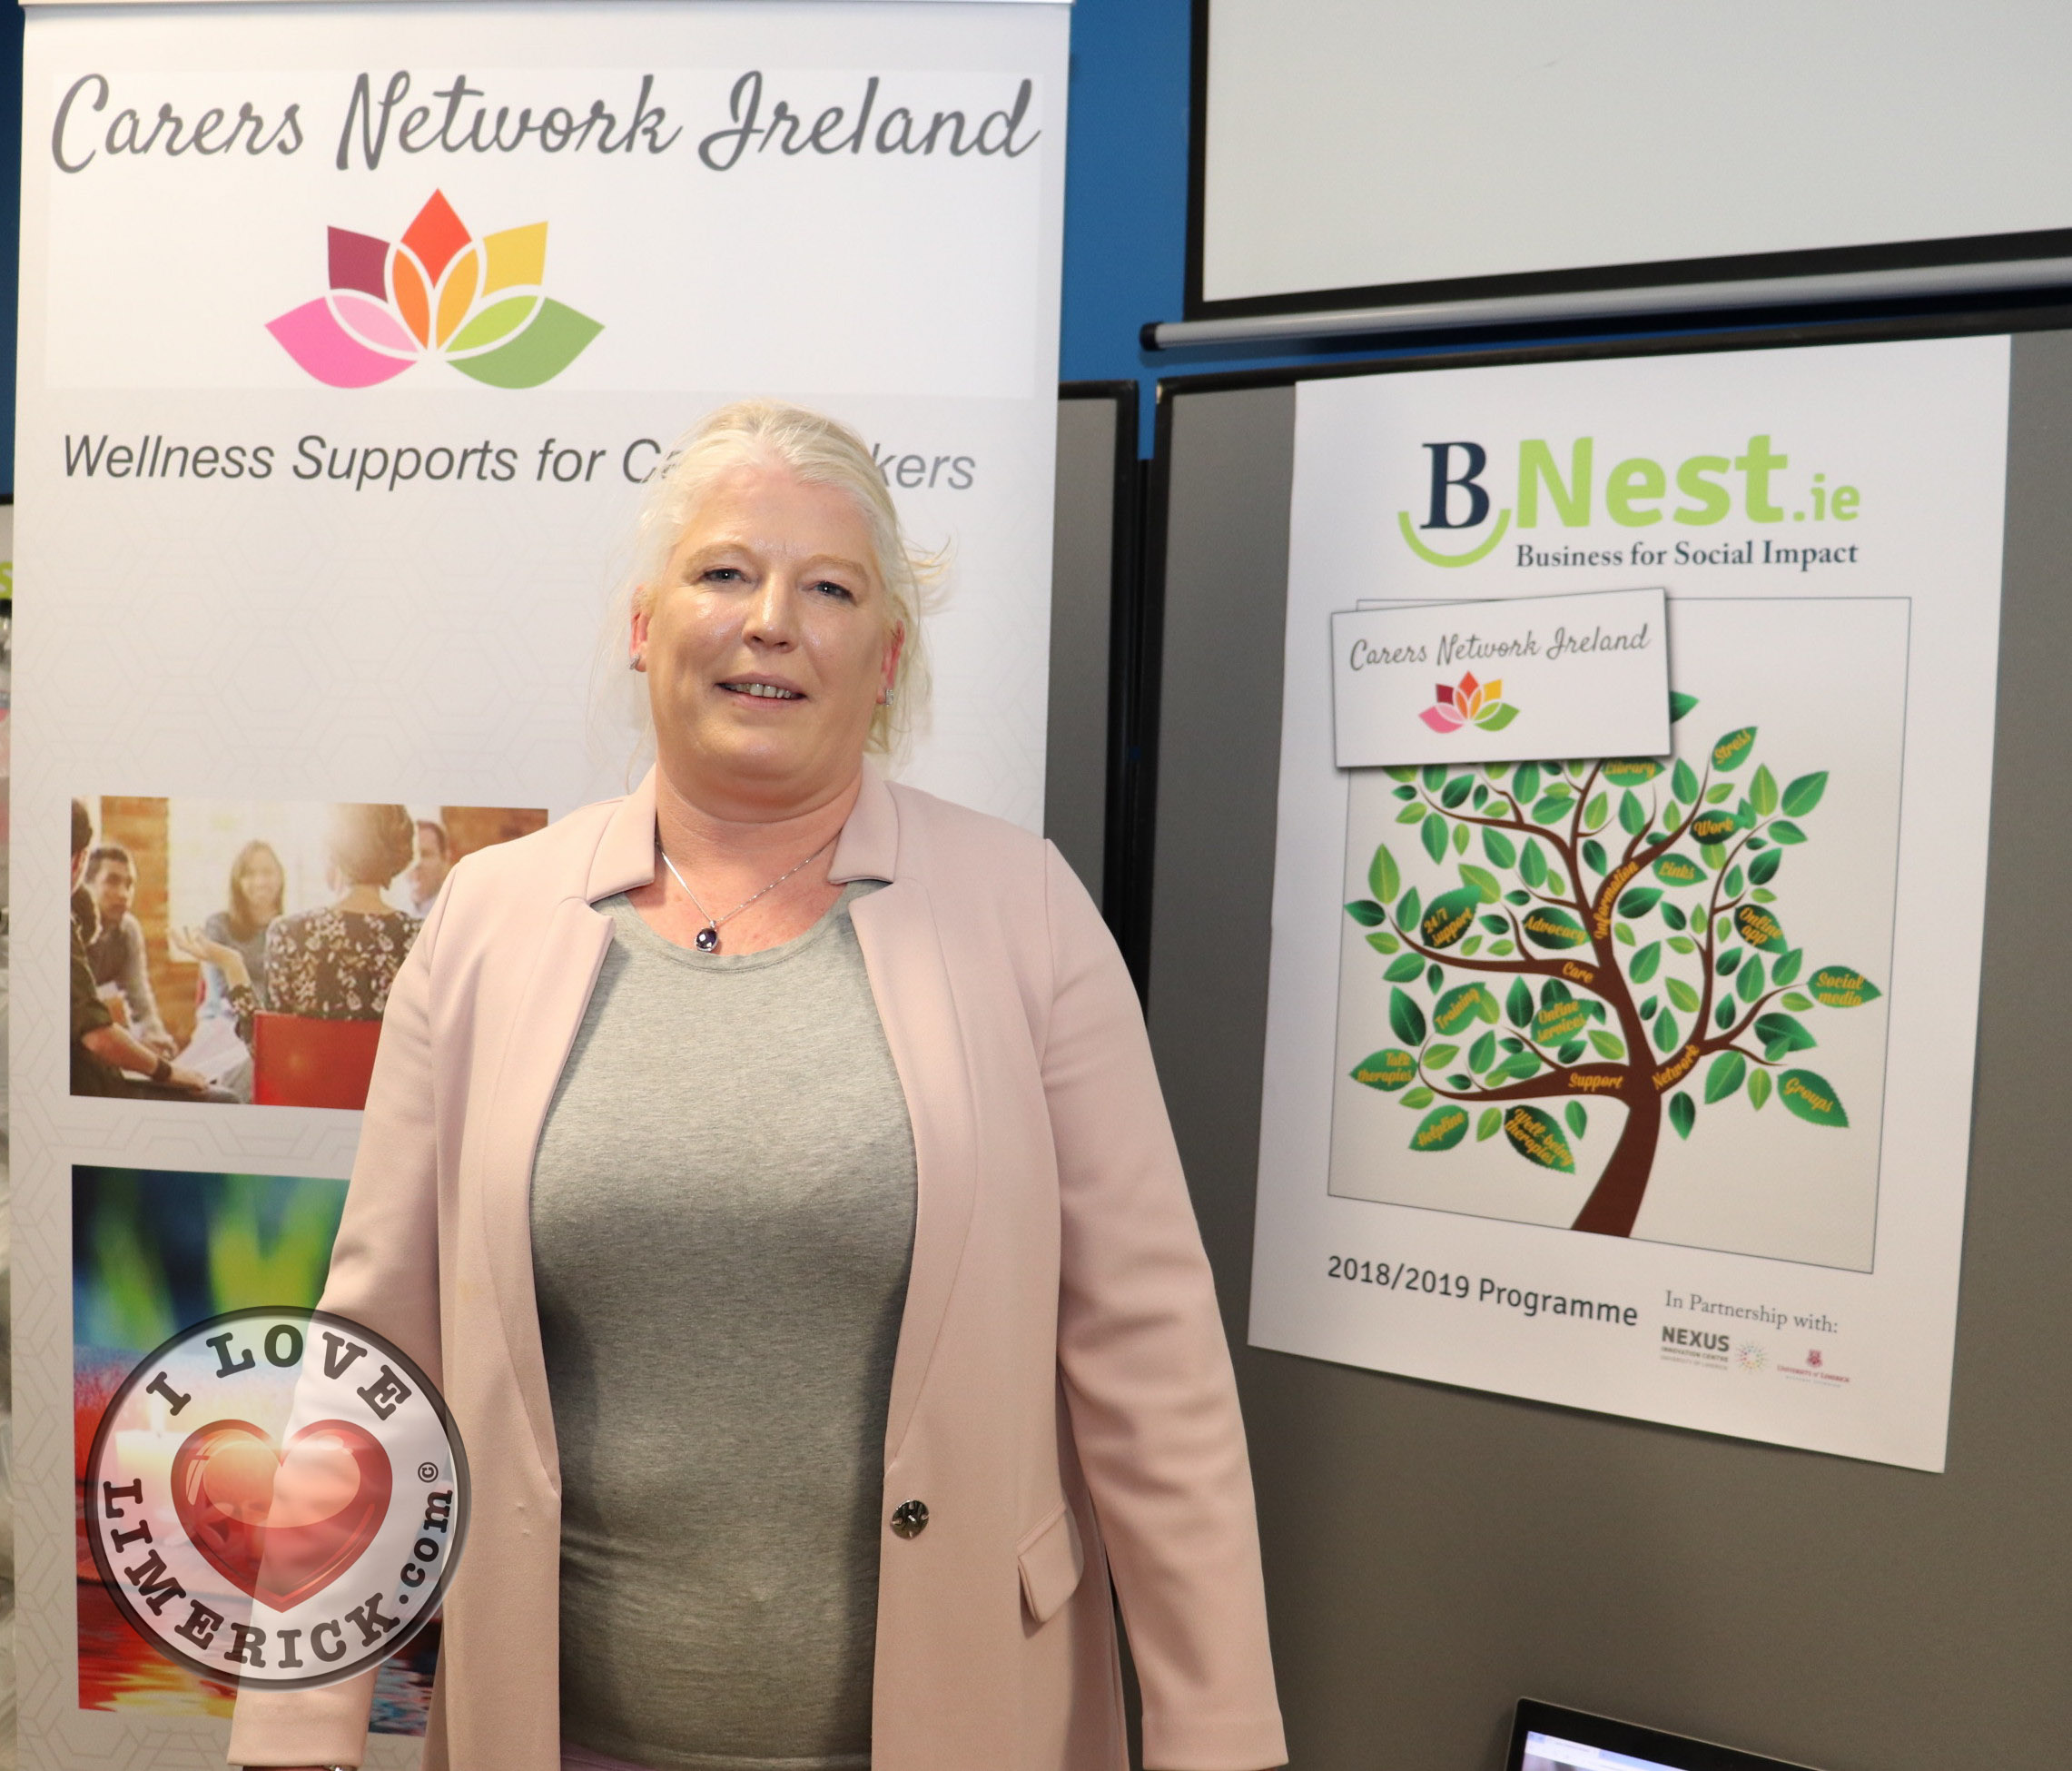 carers network ireland